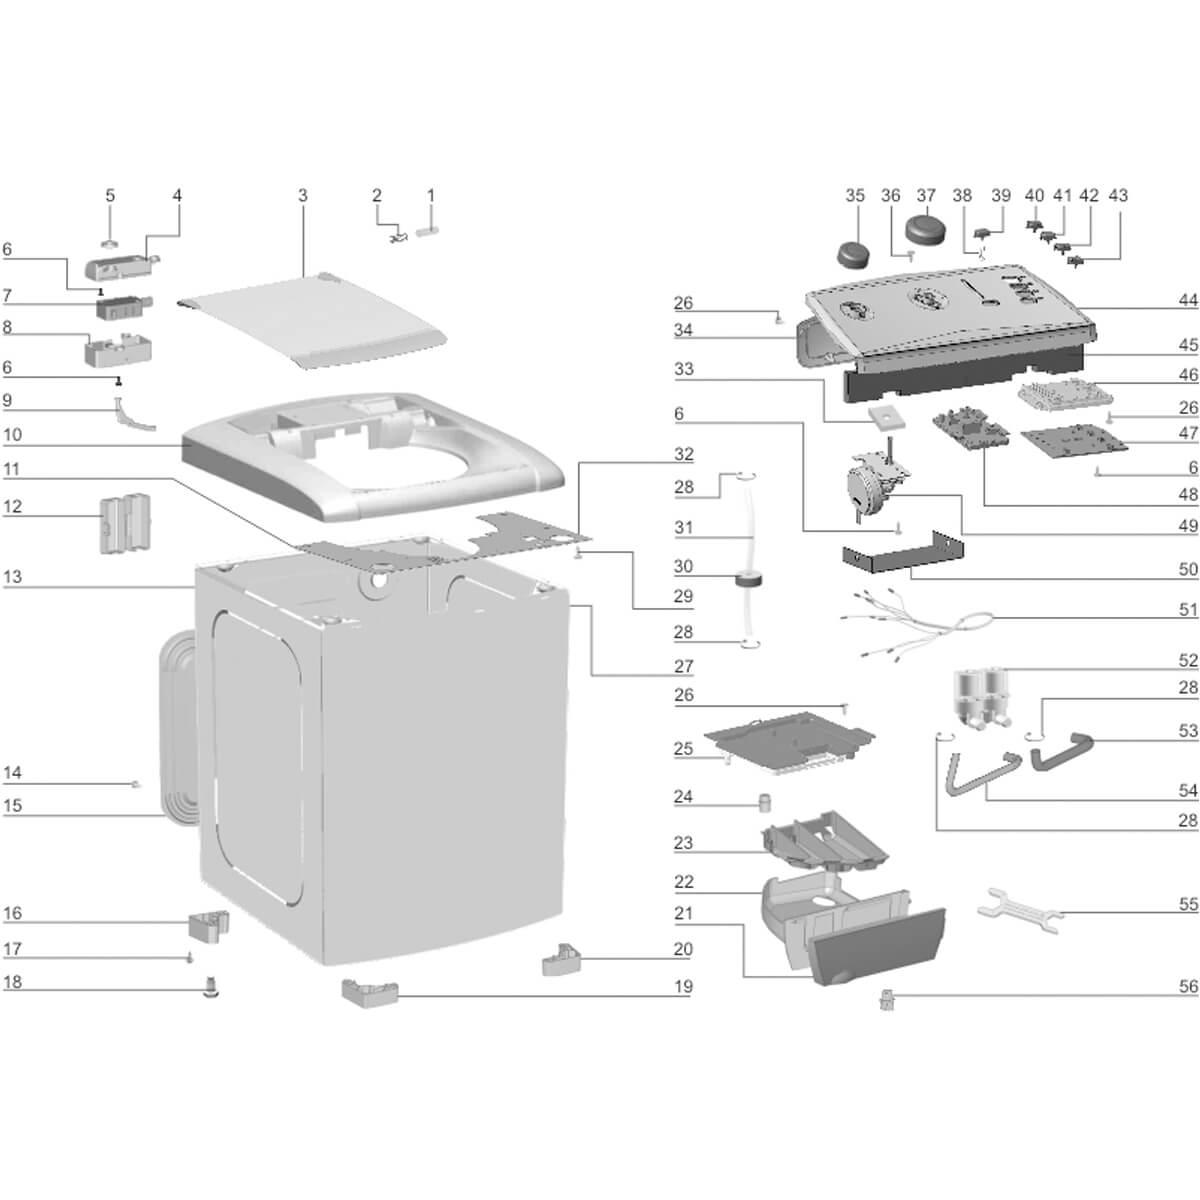 Botão Seletor De Programas Para Lavadora De Roupas Electrolux LTC10 LTC12 LB12Q LBT12 -  67400343